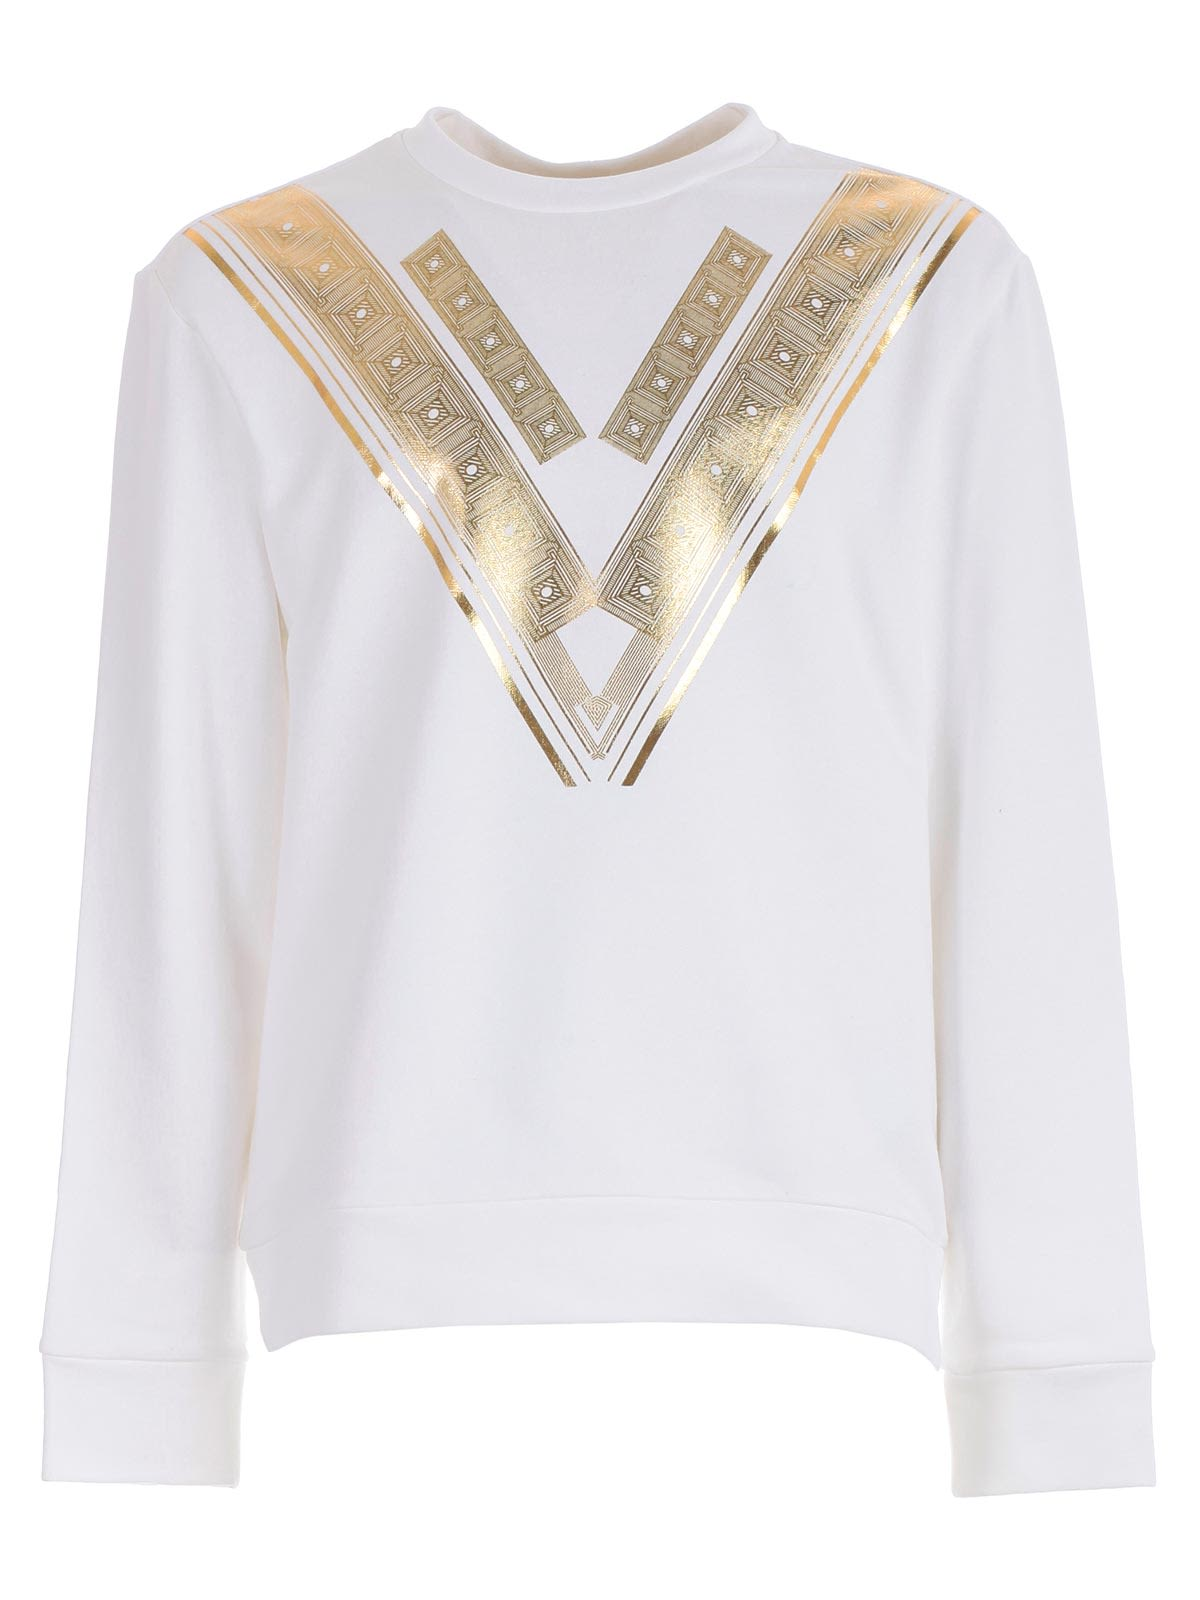 Versace Collection Printed Sweatshirt